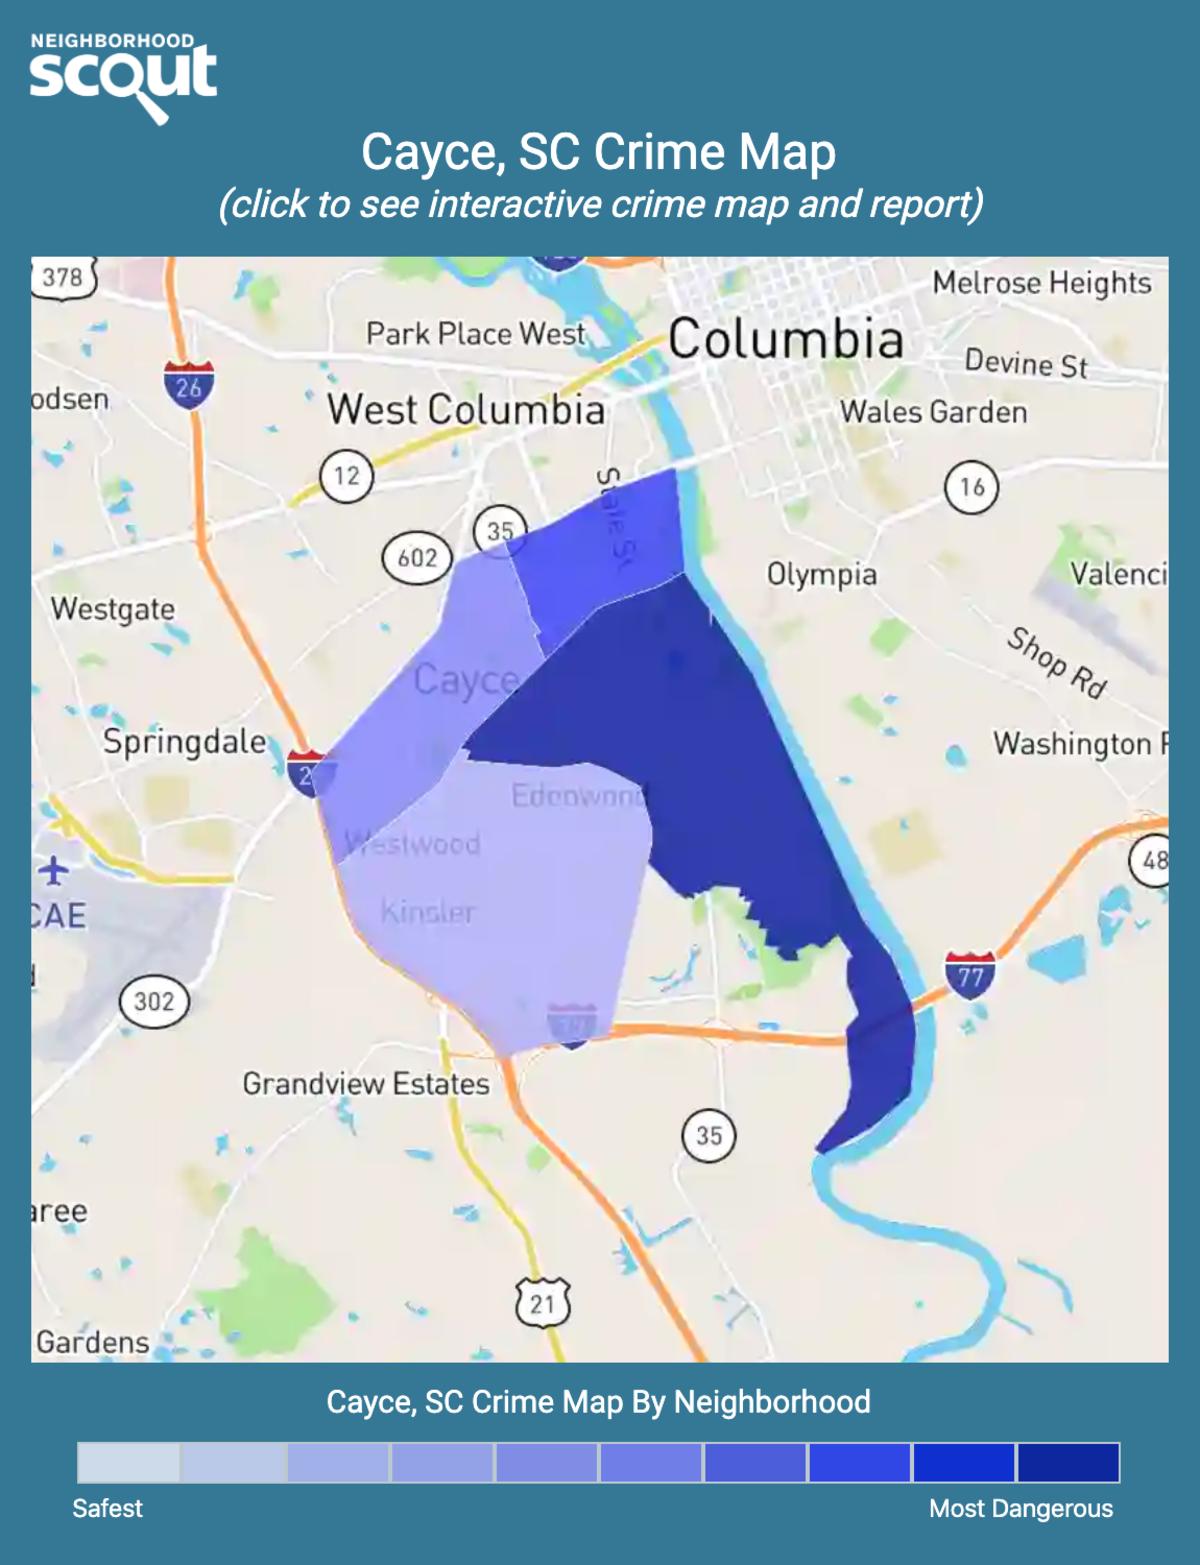 Cayce, South Carolina crime map